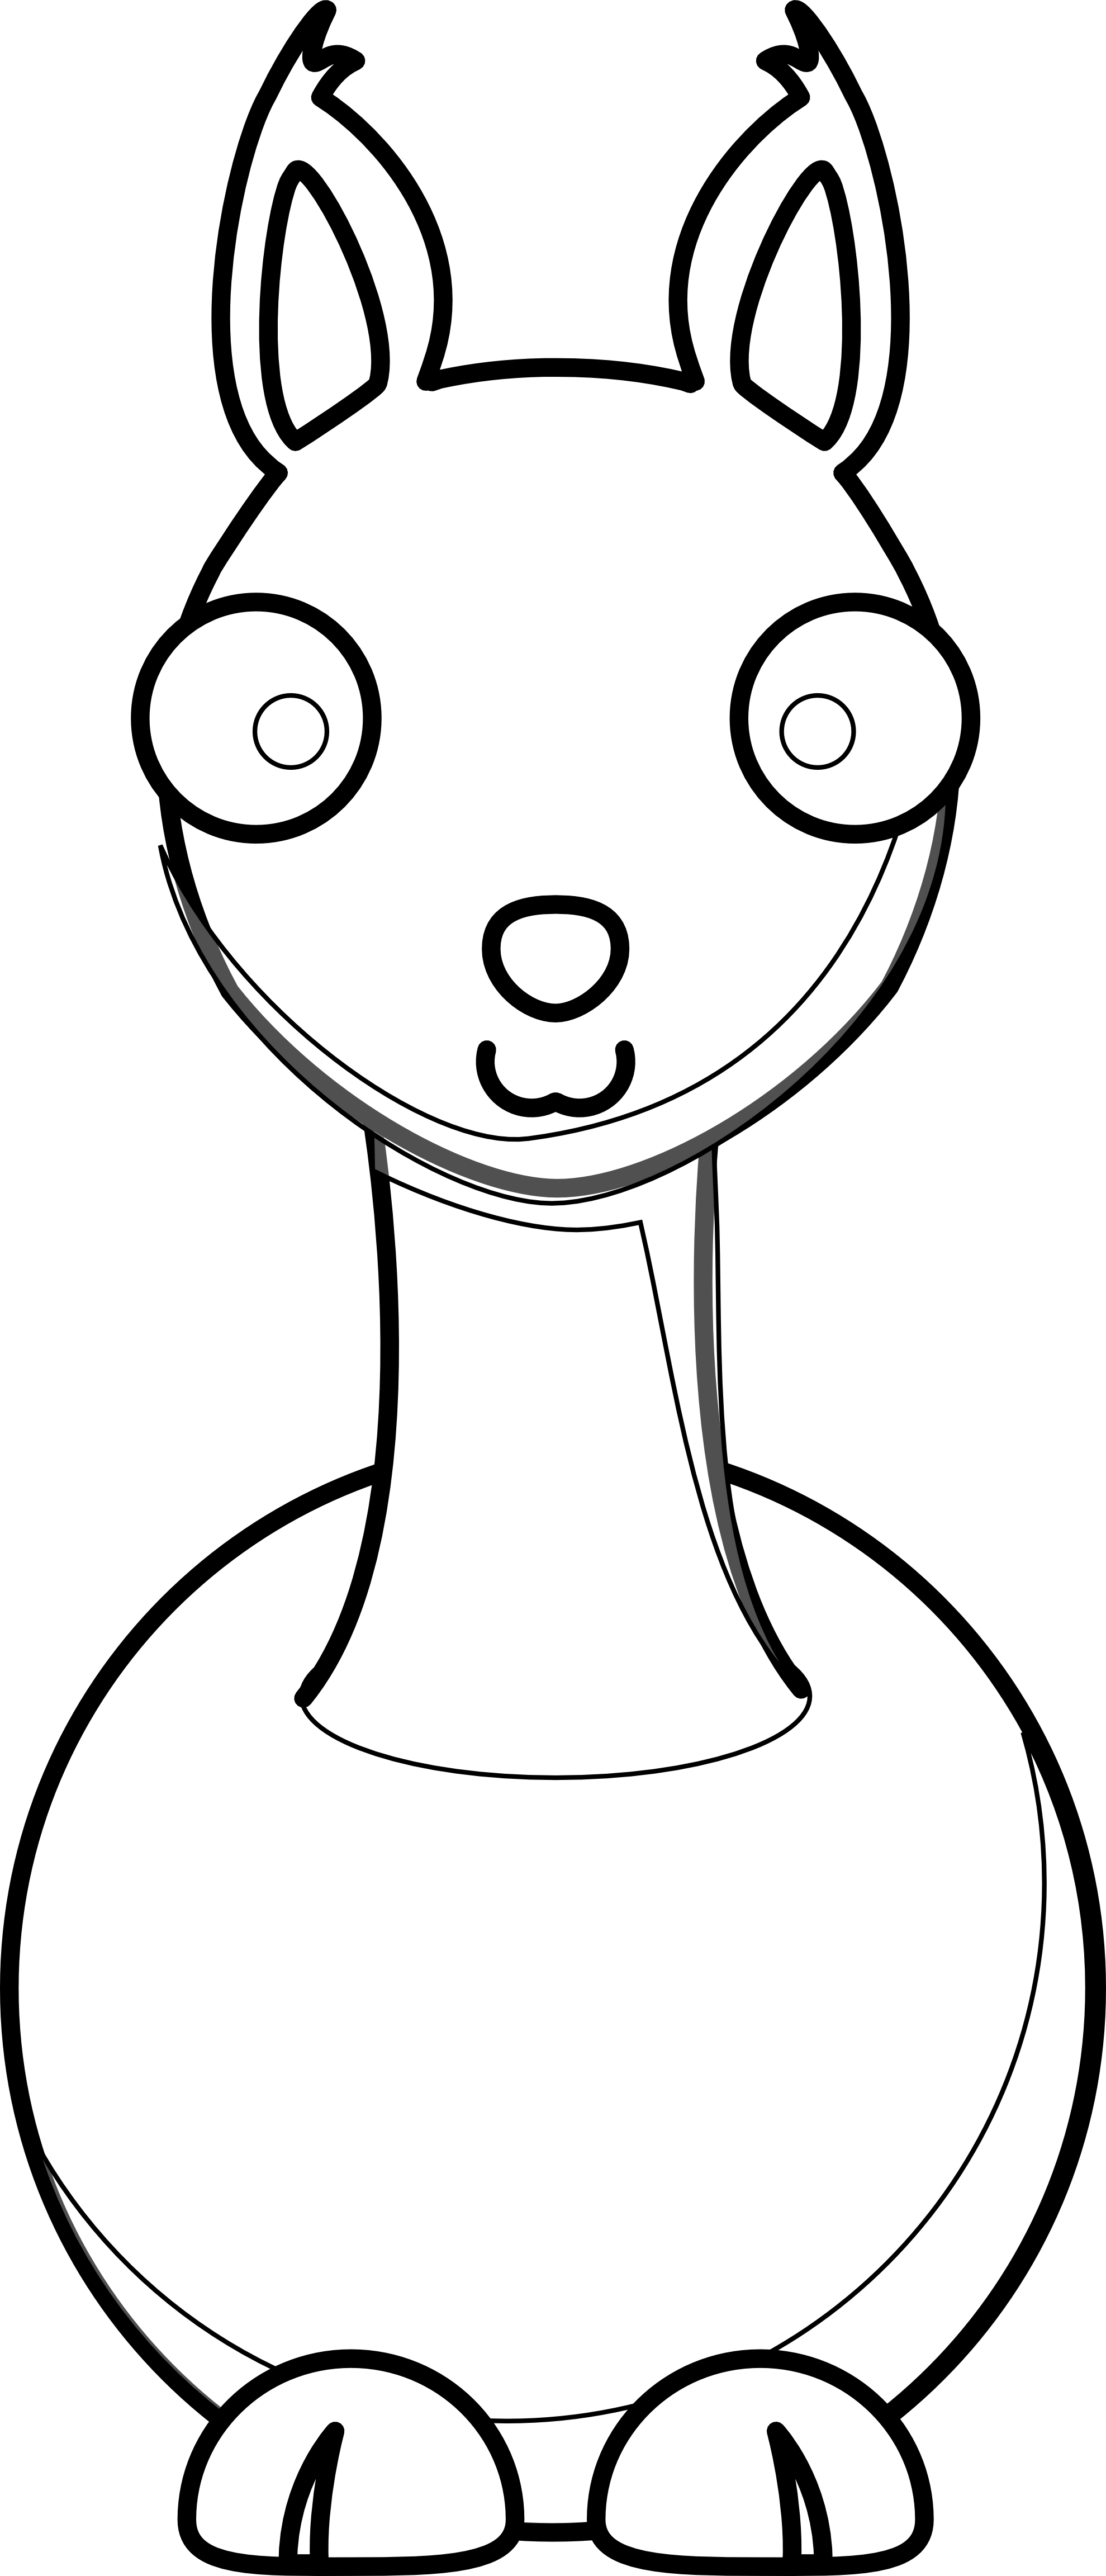 Line Art Adobe Illustrator : Cartoon llama black white line art svg inkscape adobe